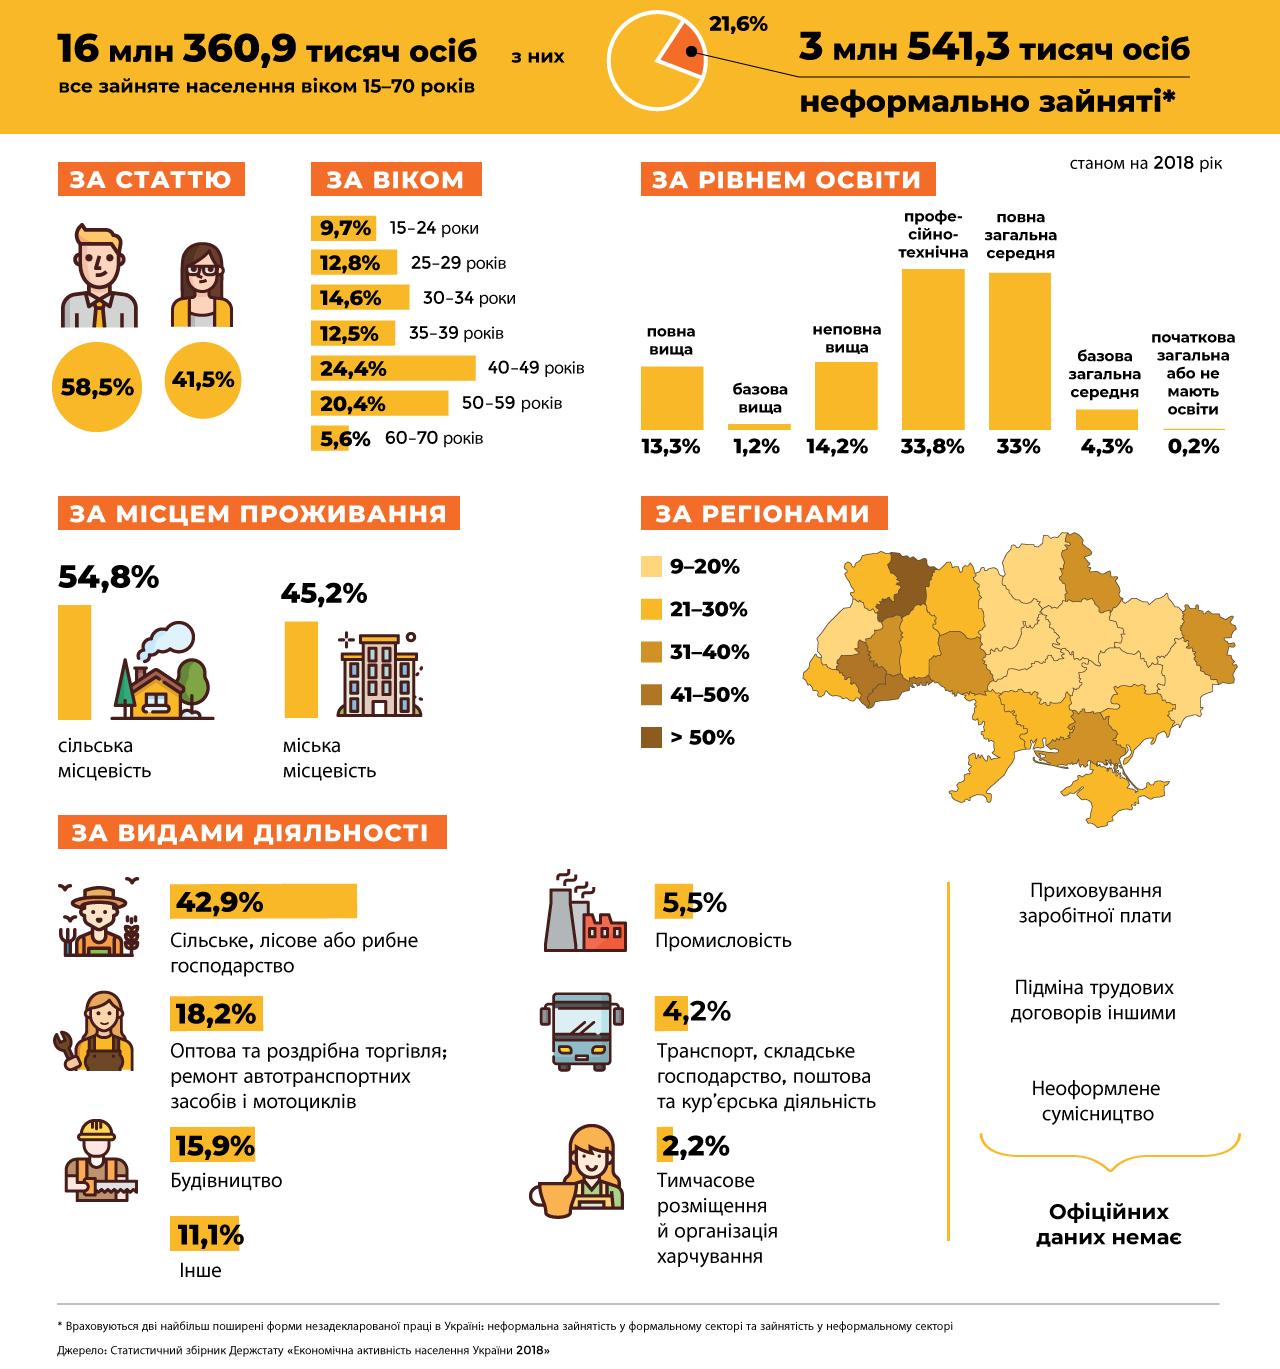 http://zt-rada.gov.ua/files/upload/all/2020/%D0%9D%D0%BE%D0%B2%D0%B8%D0%BD%D0%B8/ilo_infographic1_3_ukr-e1579623759353.png